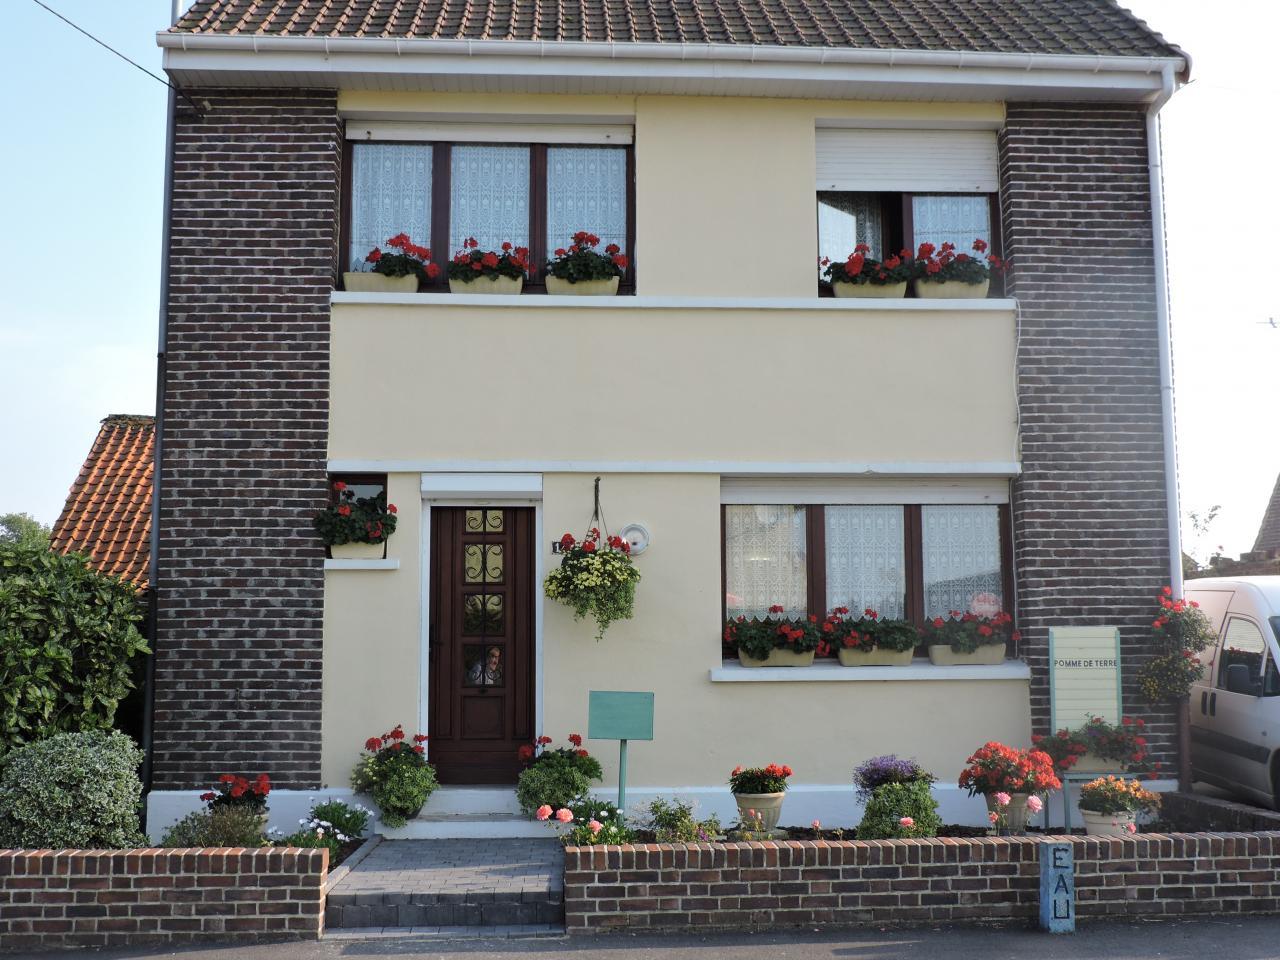 Maisons fleuries 2014 (4)